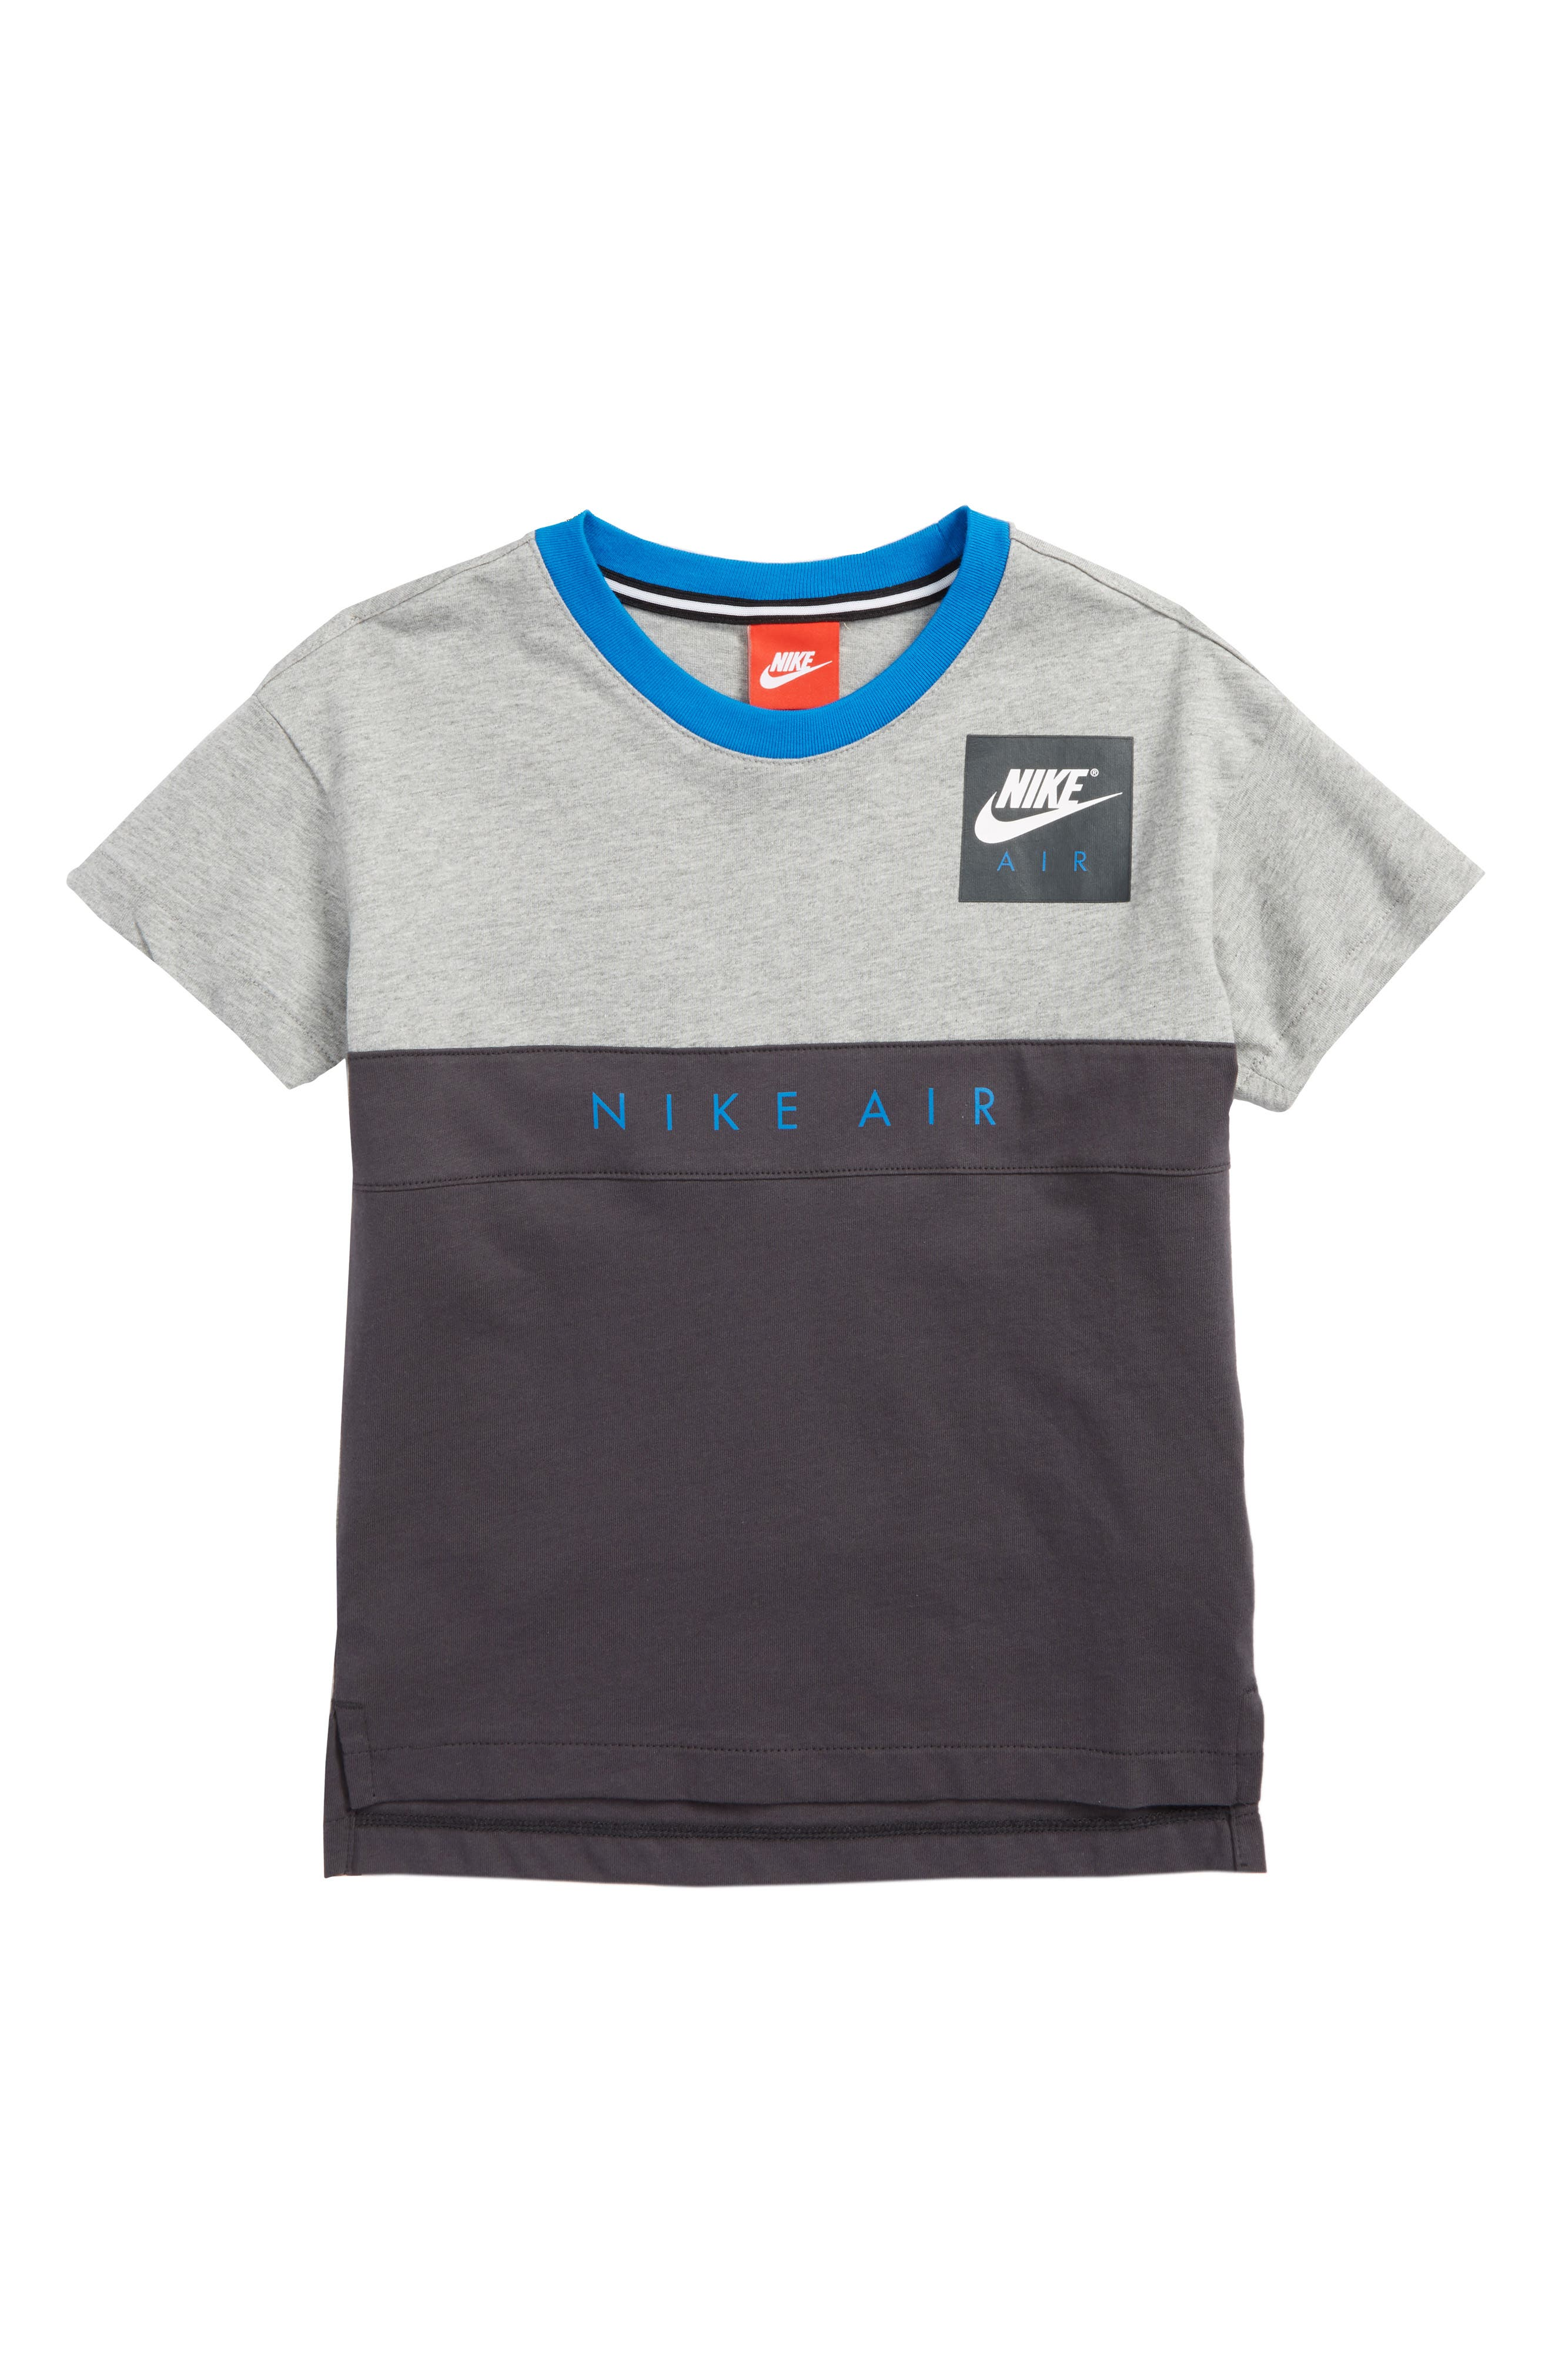 Air Shirt,                         Main,                         color, Dark Grey Heather/ Anthracite